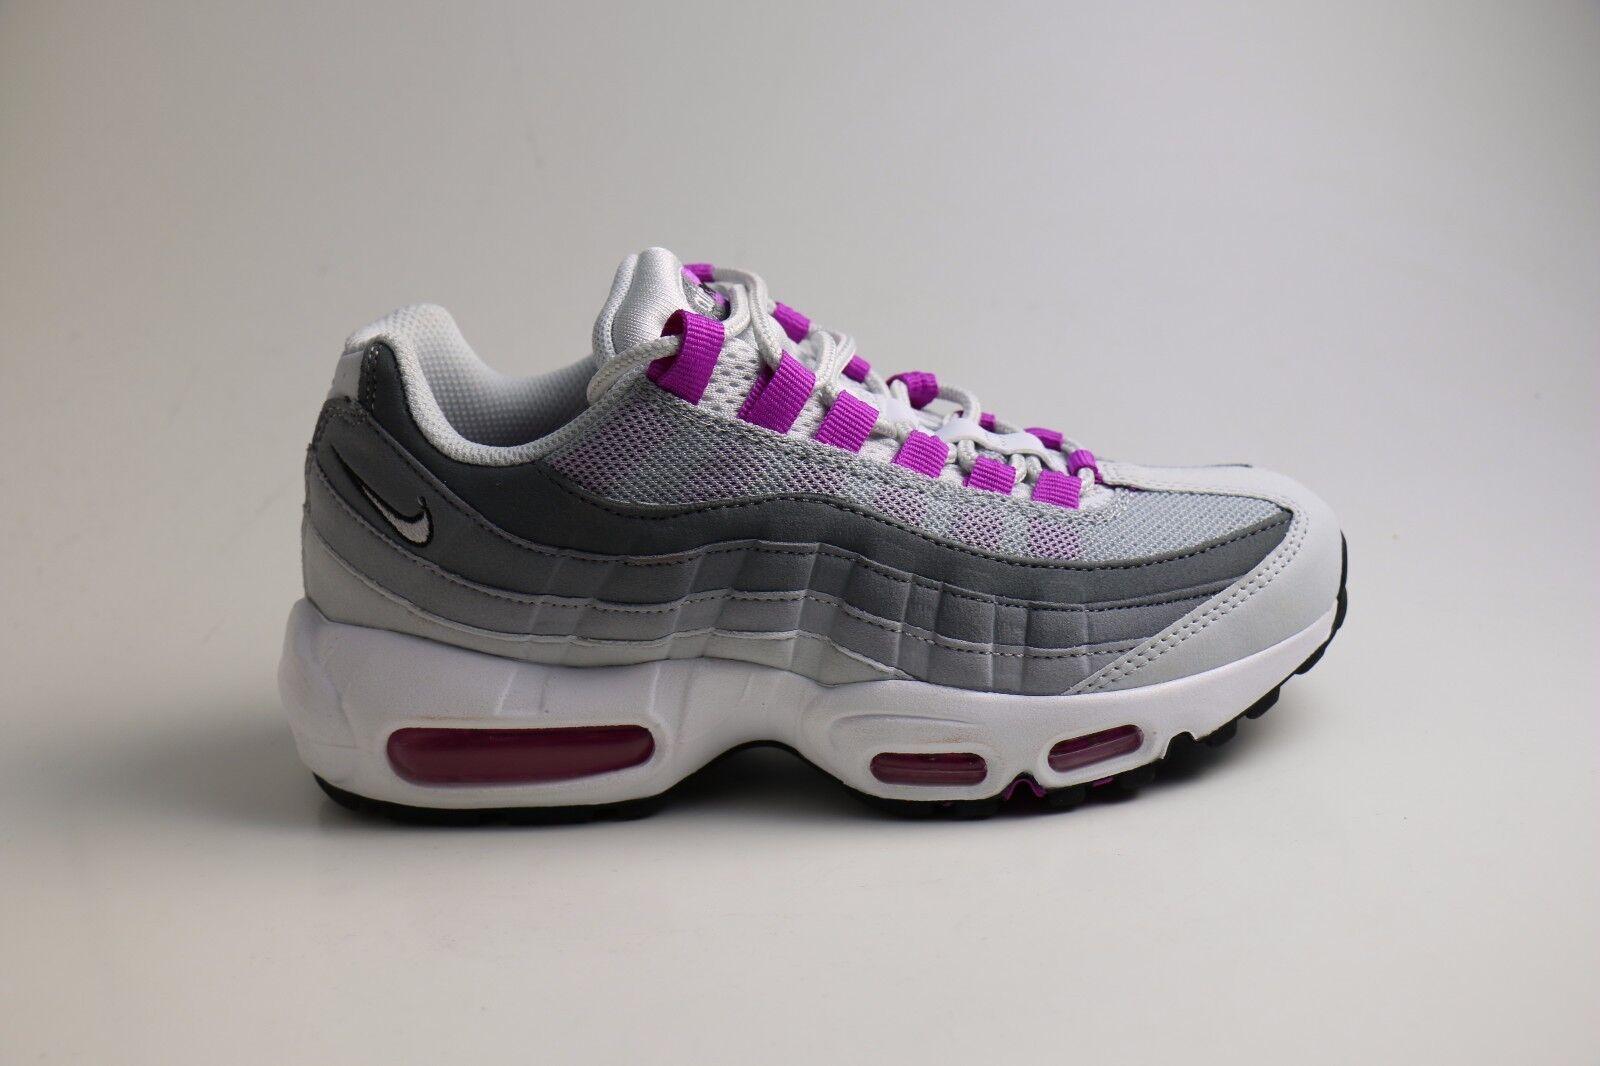 Nike Wmns Bir Max 95 Pure Platinum Hyper Violet 38 39 40 US 7 8 8,5 307960 001